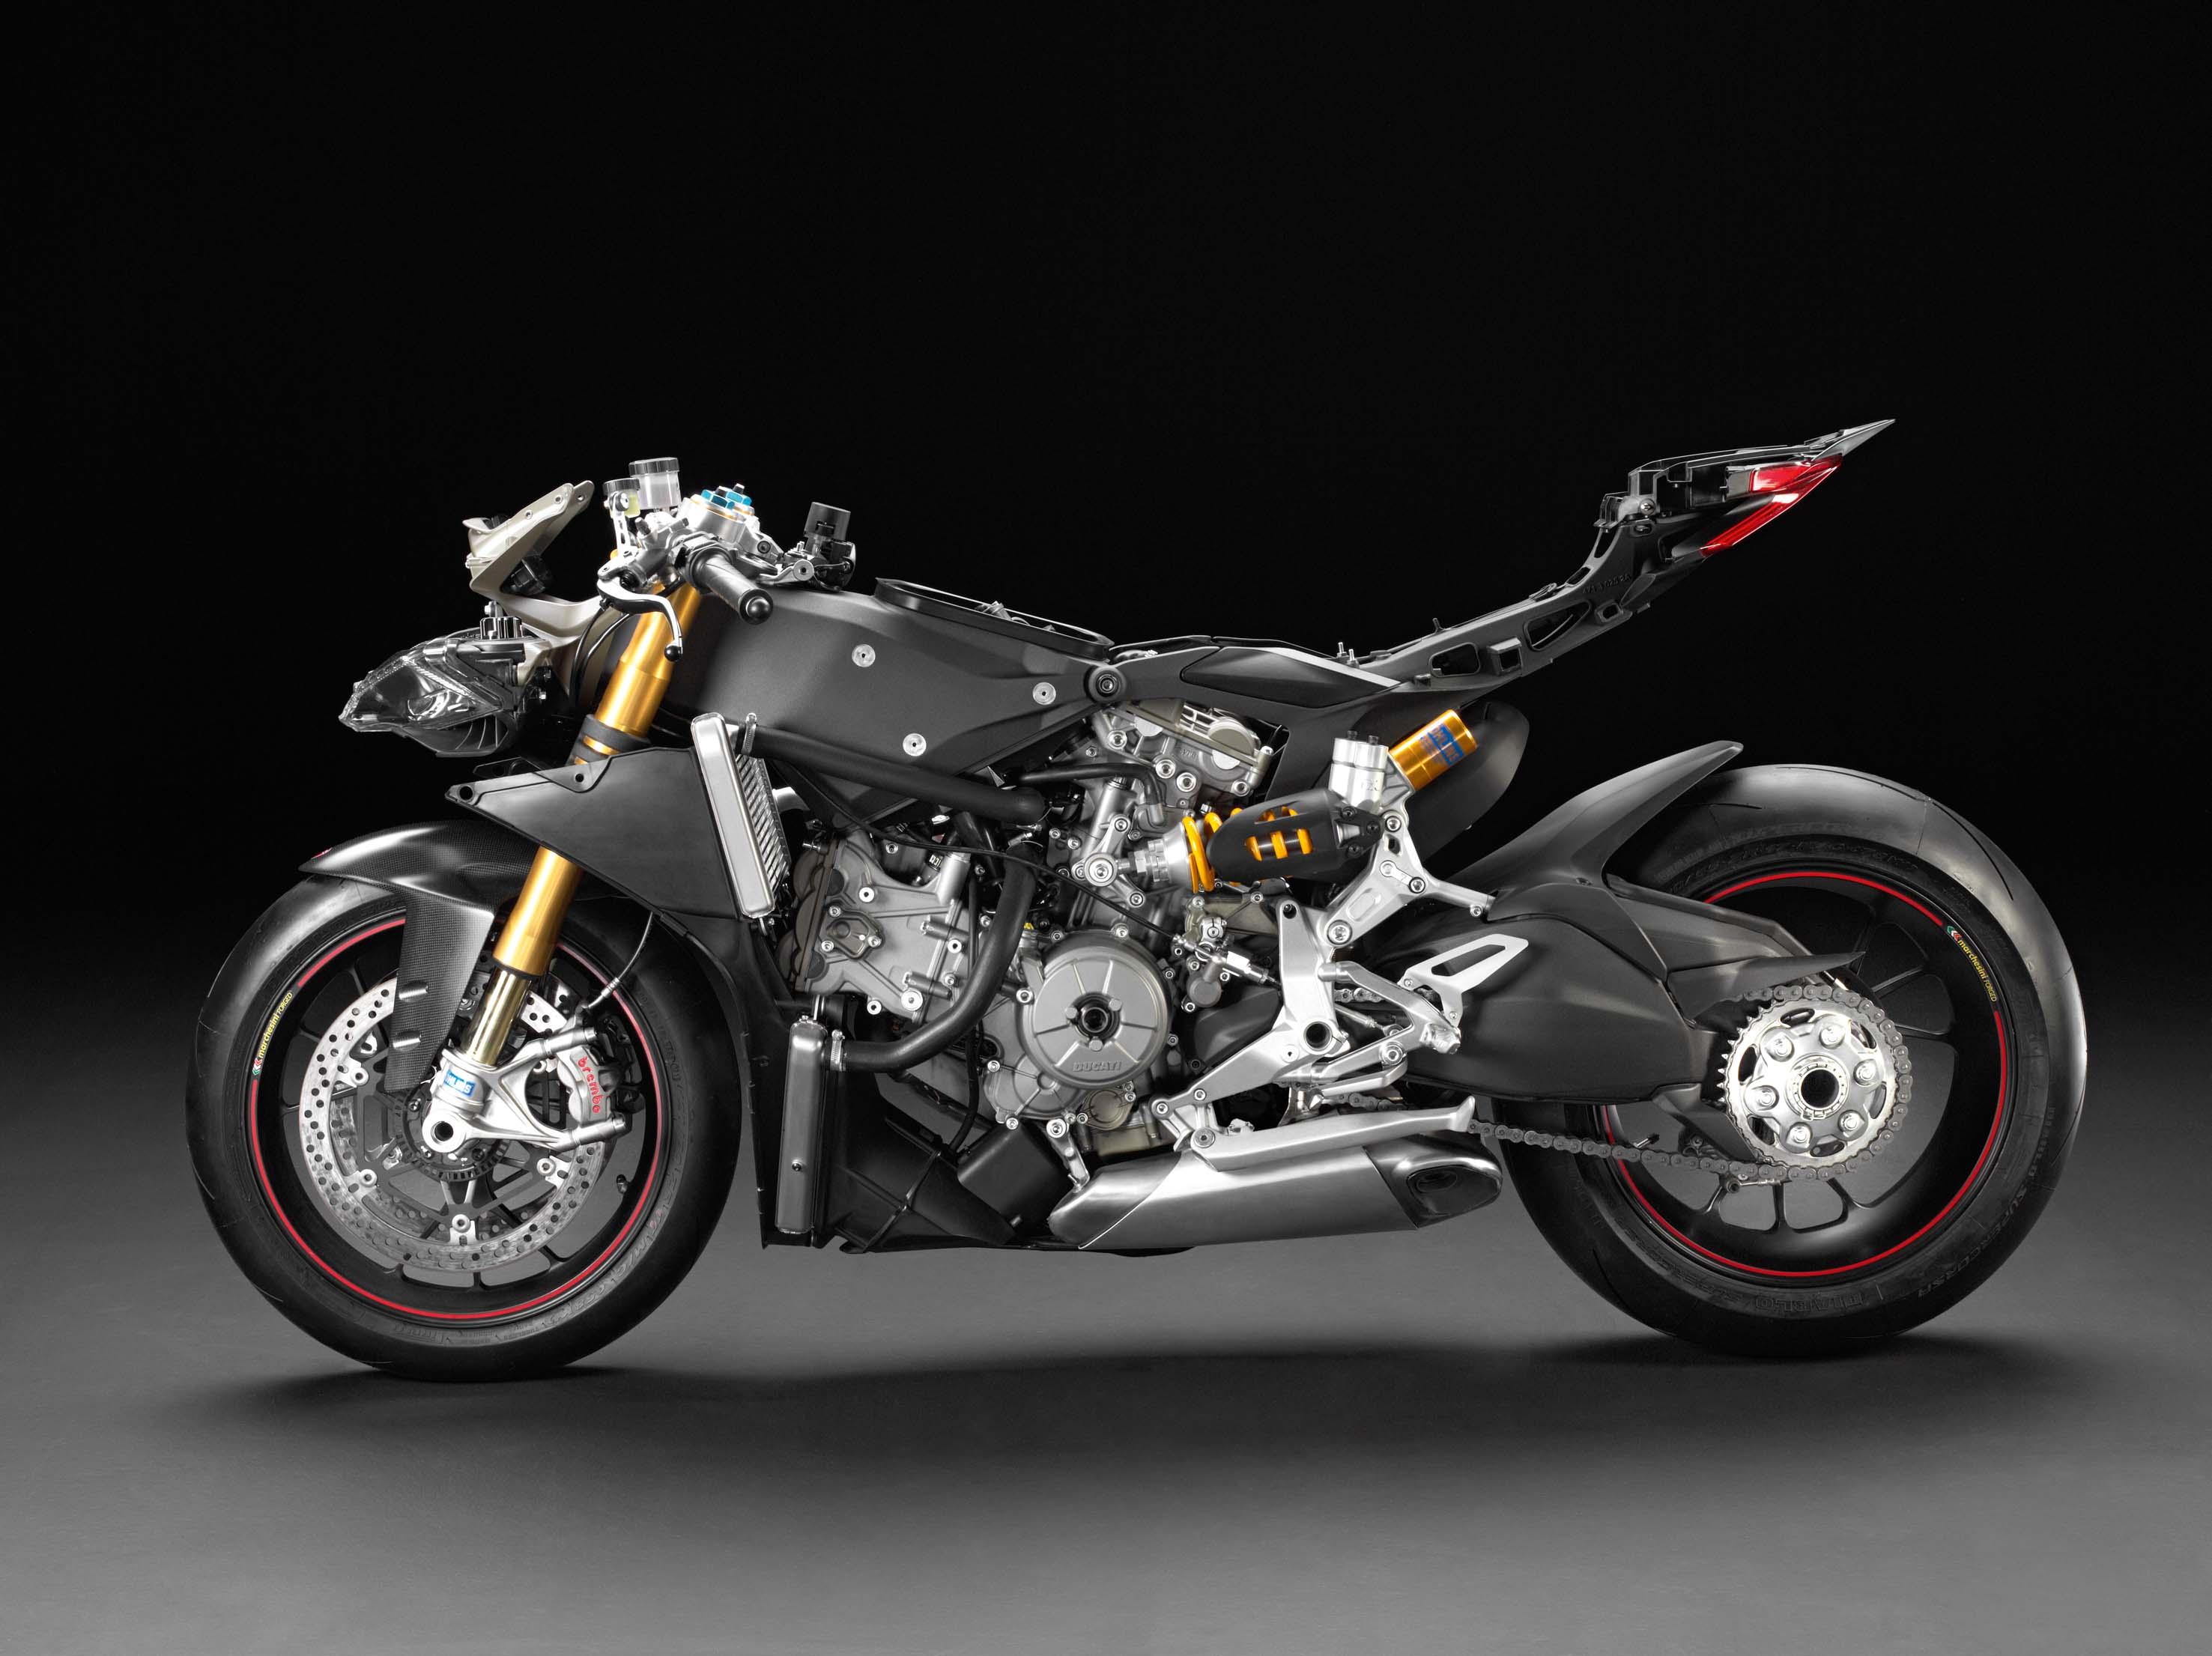 Photos Underneath The Ducati 1199 Panigale S Fairings